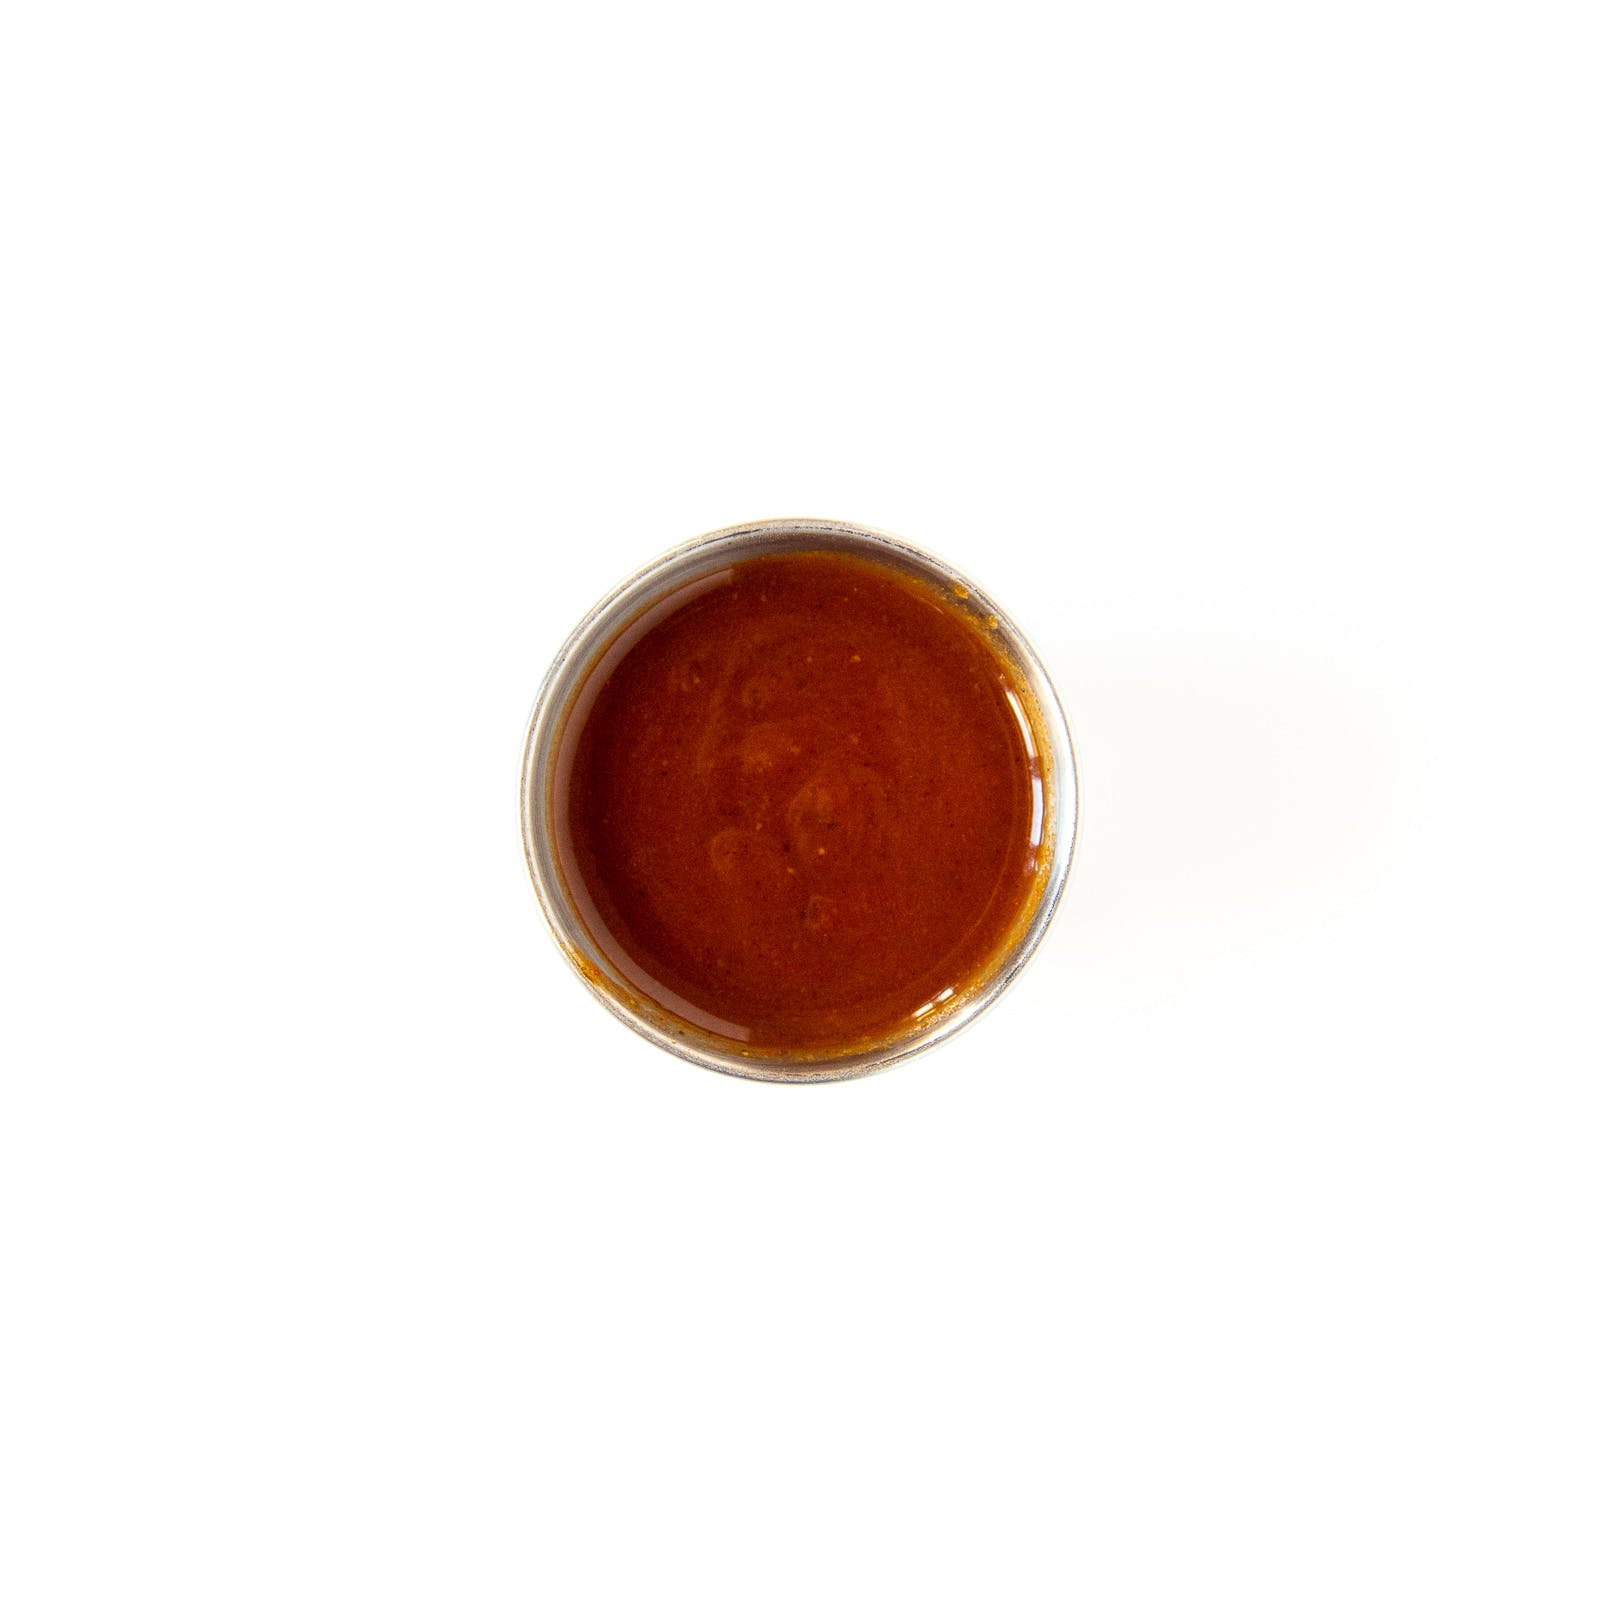 Carolina BBQ Sauce from Midcoast Wings - Wausau in Wausau, WI